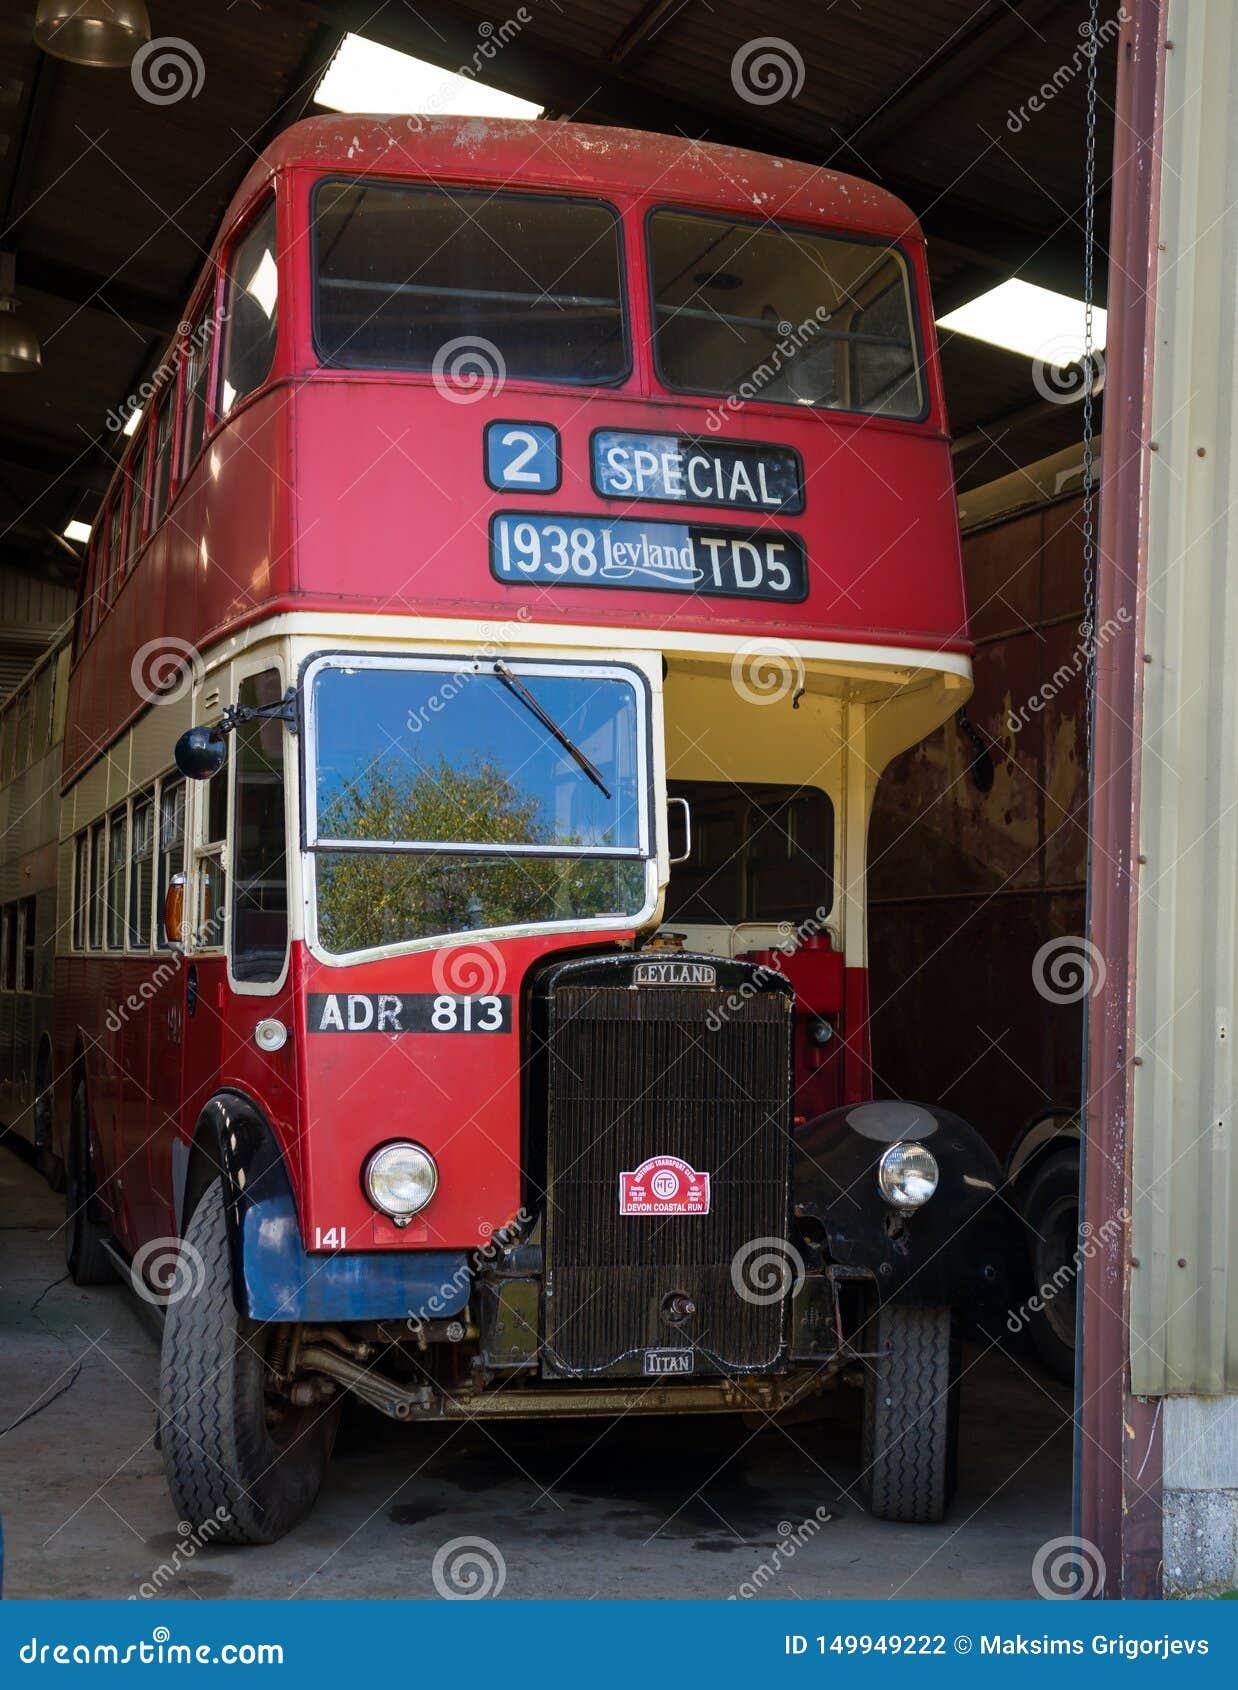 Vintage Red double-decker bus in garage ready for annual Devon coastal run, Winkleigh, United Kingdom, August 5, 2018